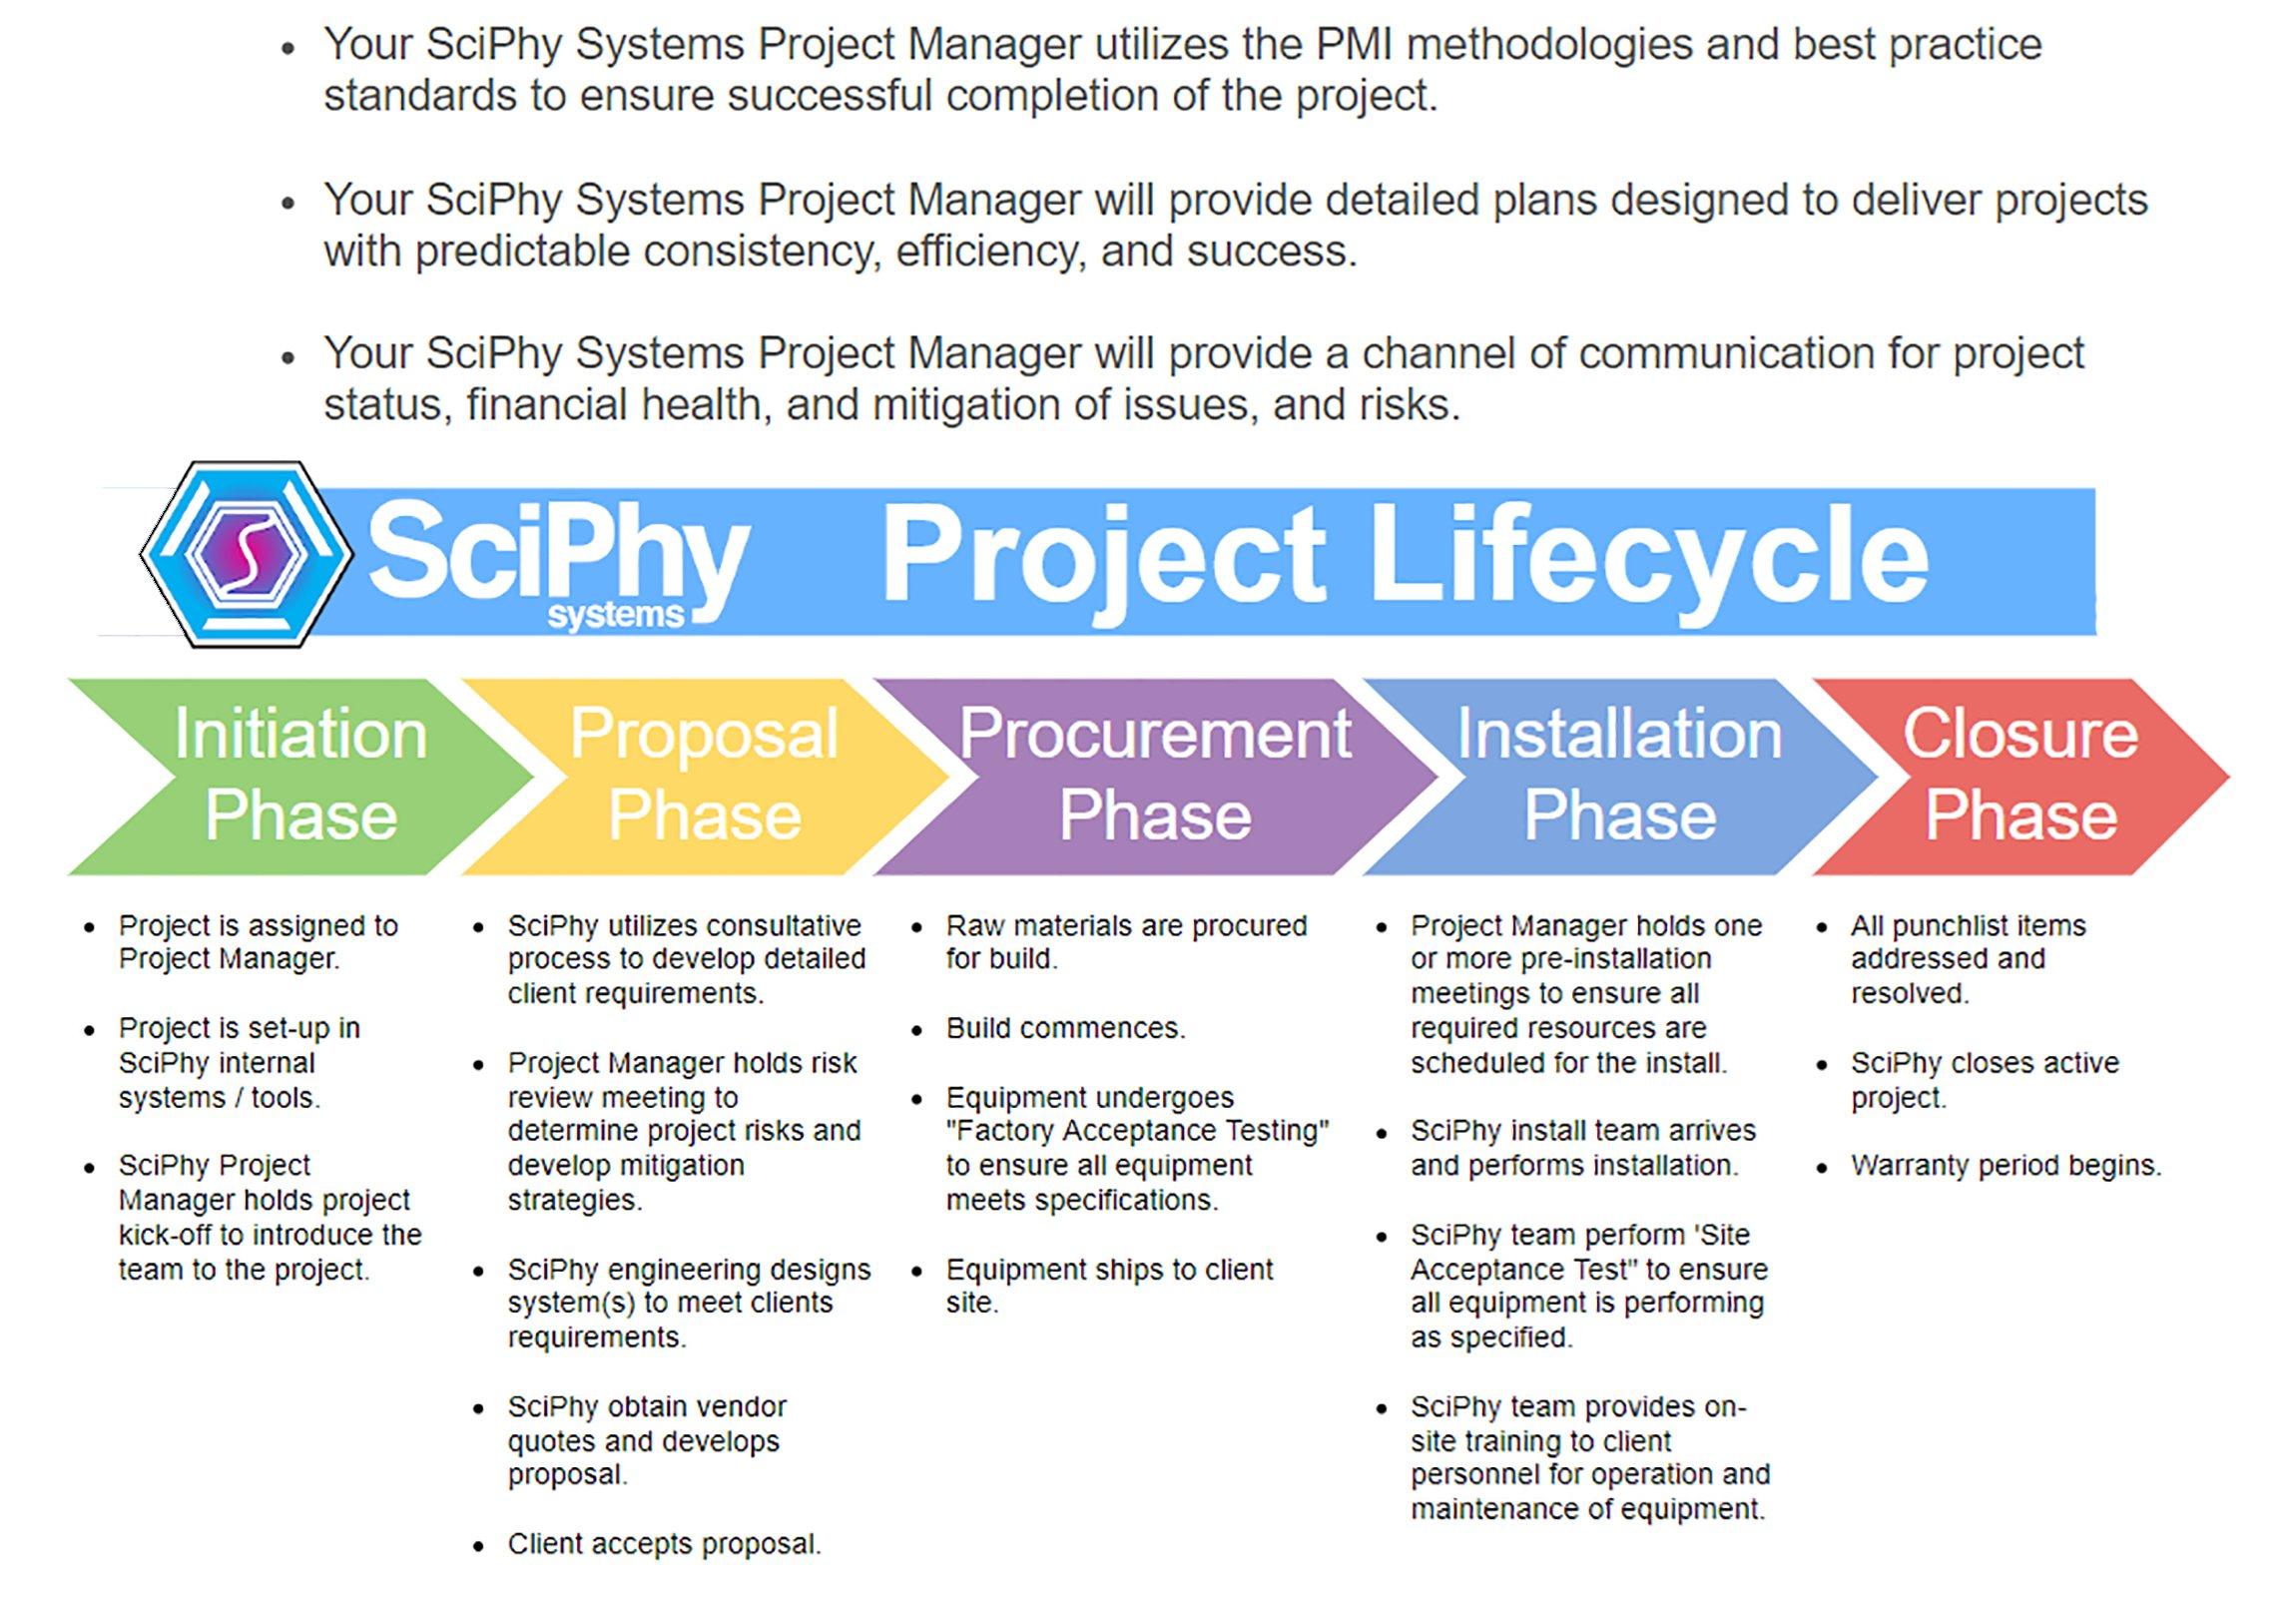 PM_Process2